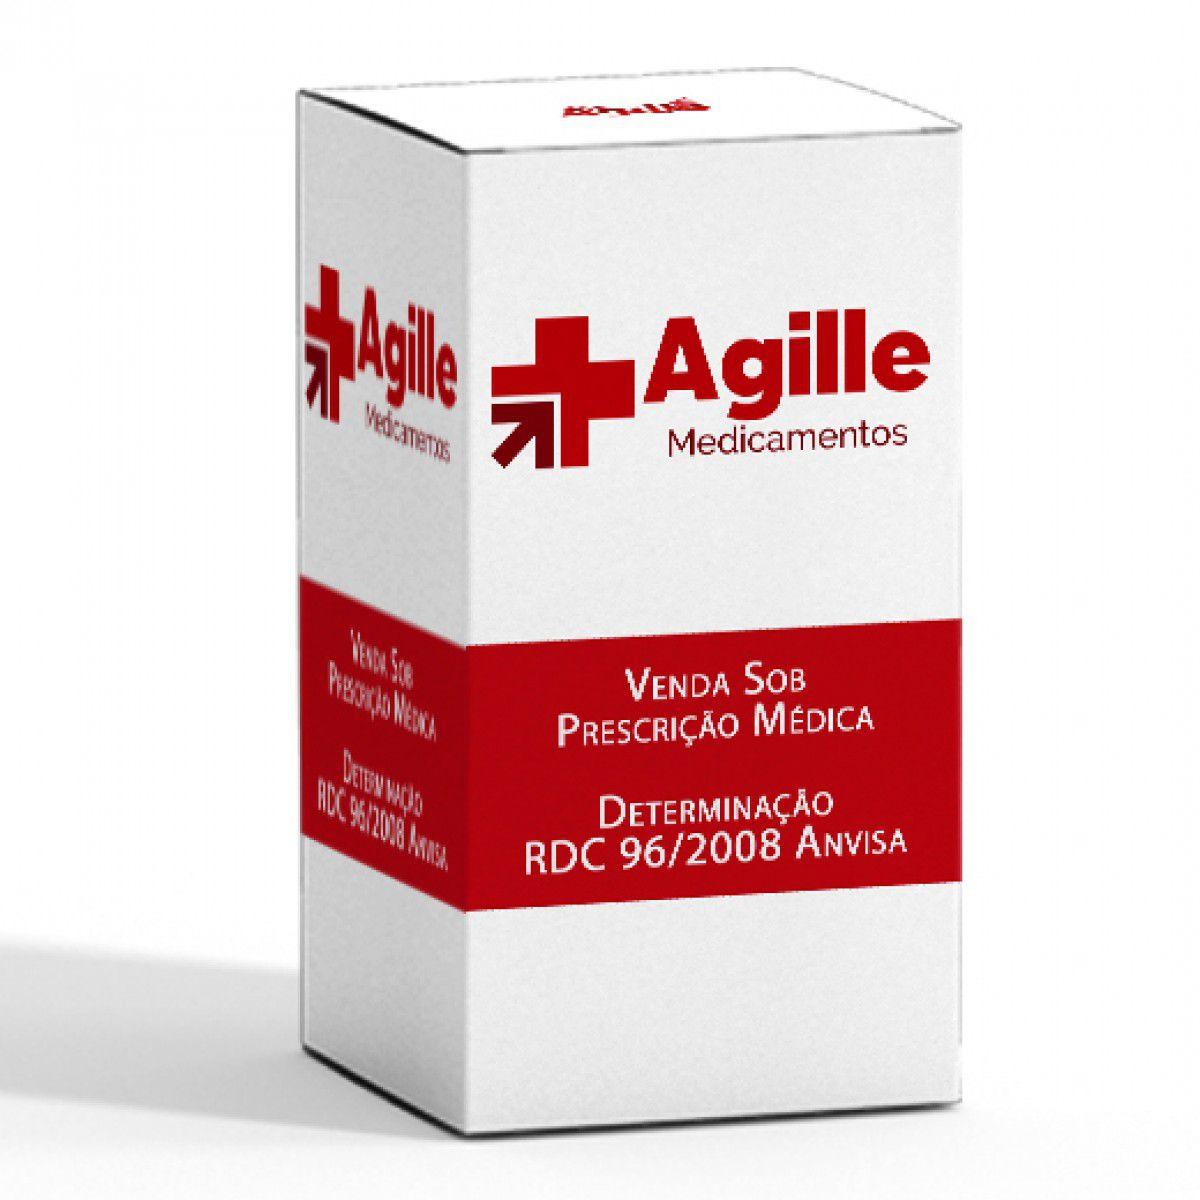 CAPRELSA 300MG C/30 COMP. REVESTIDOS  - Agille Speciality